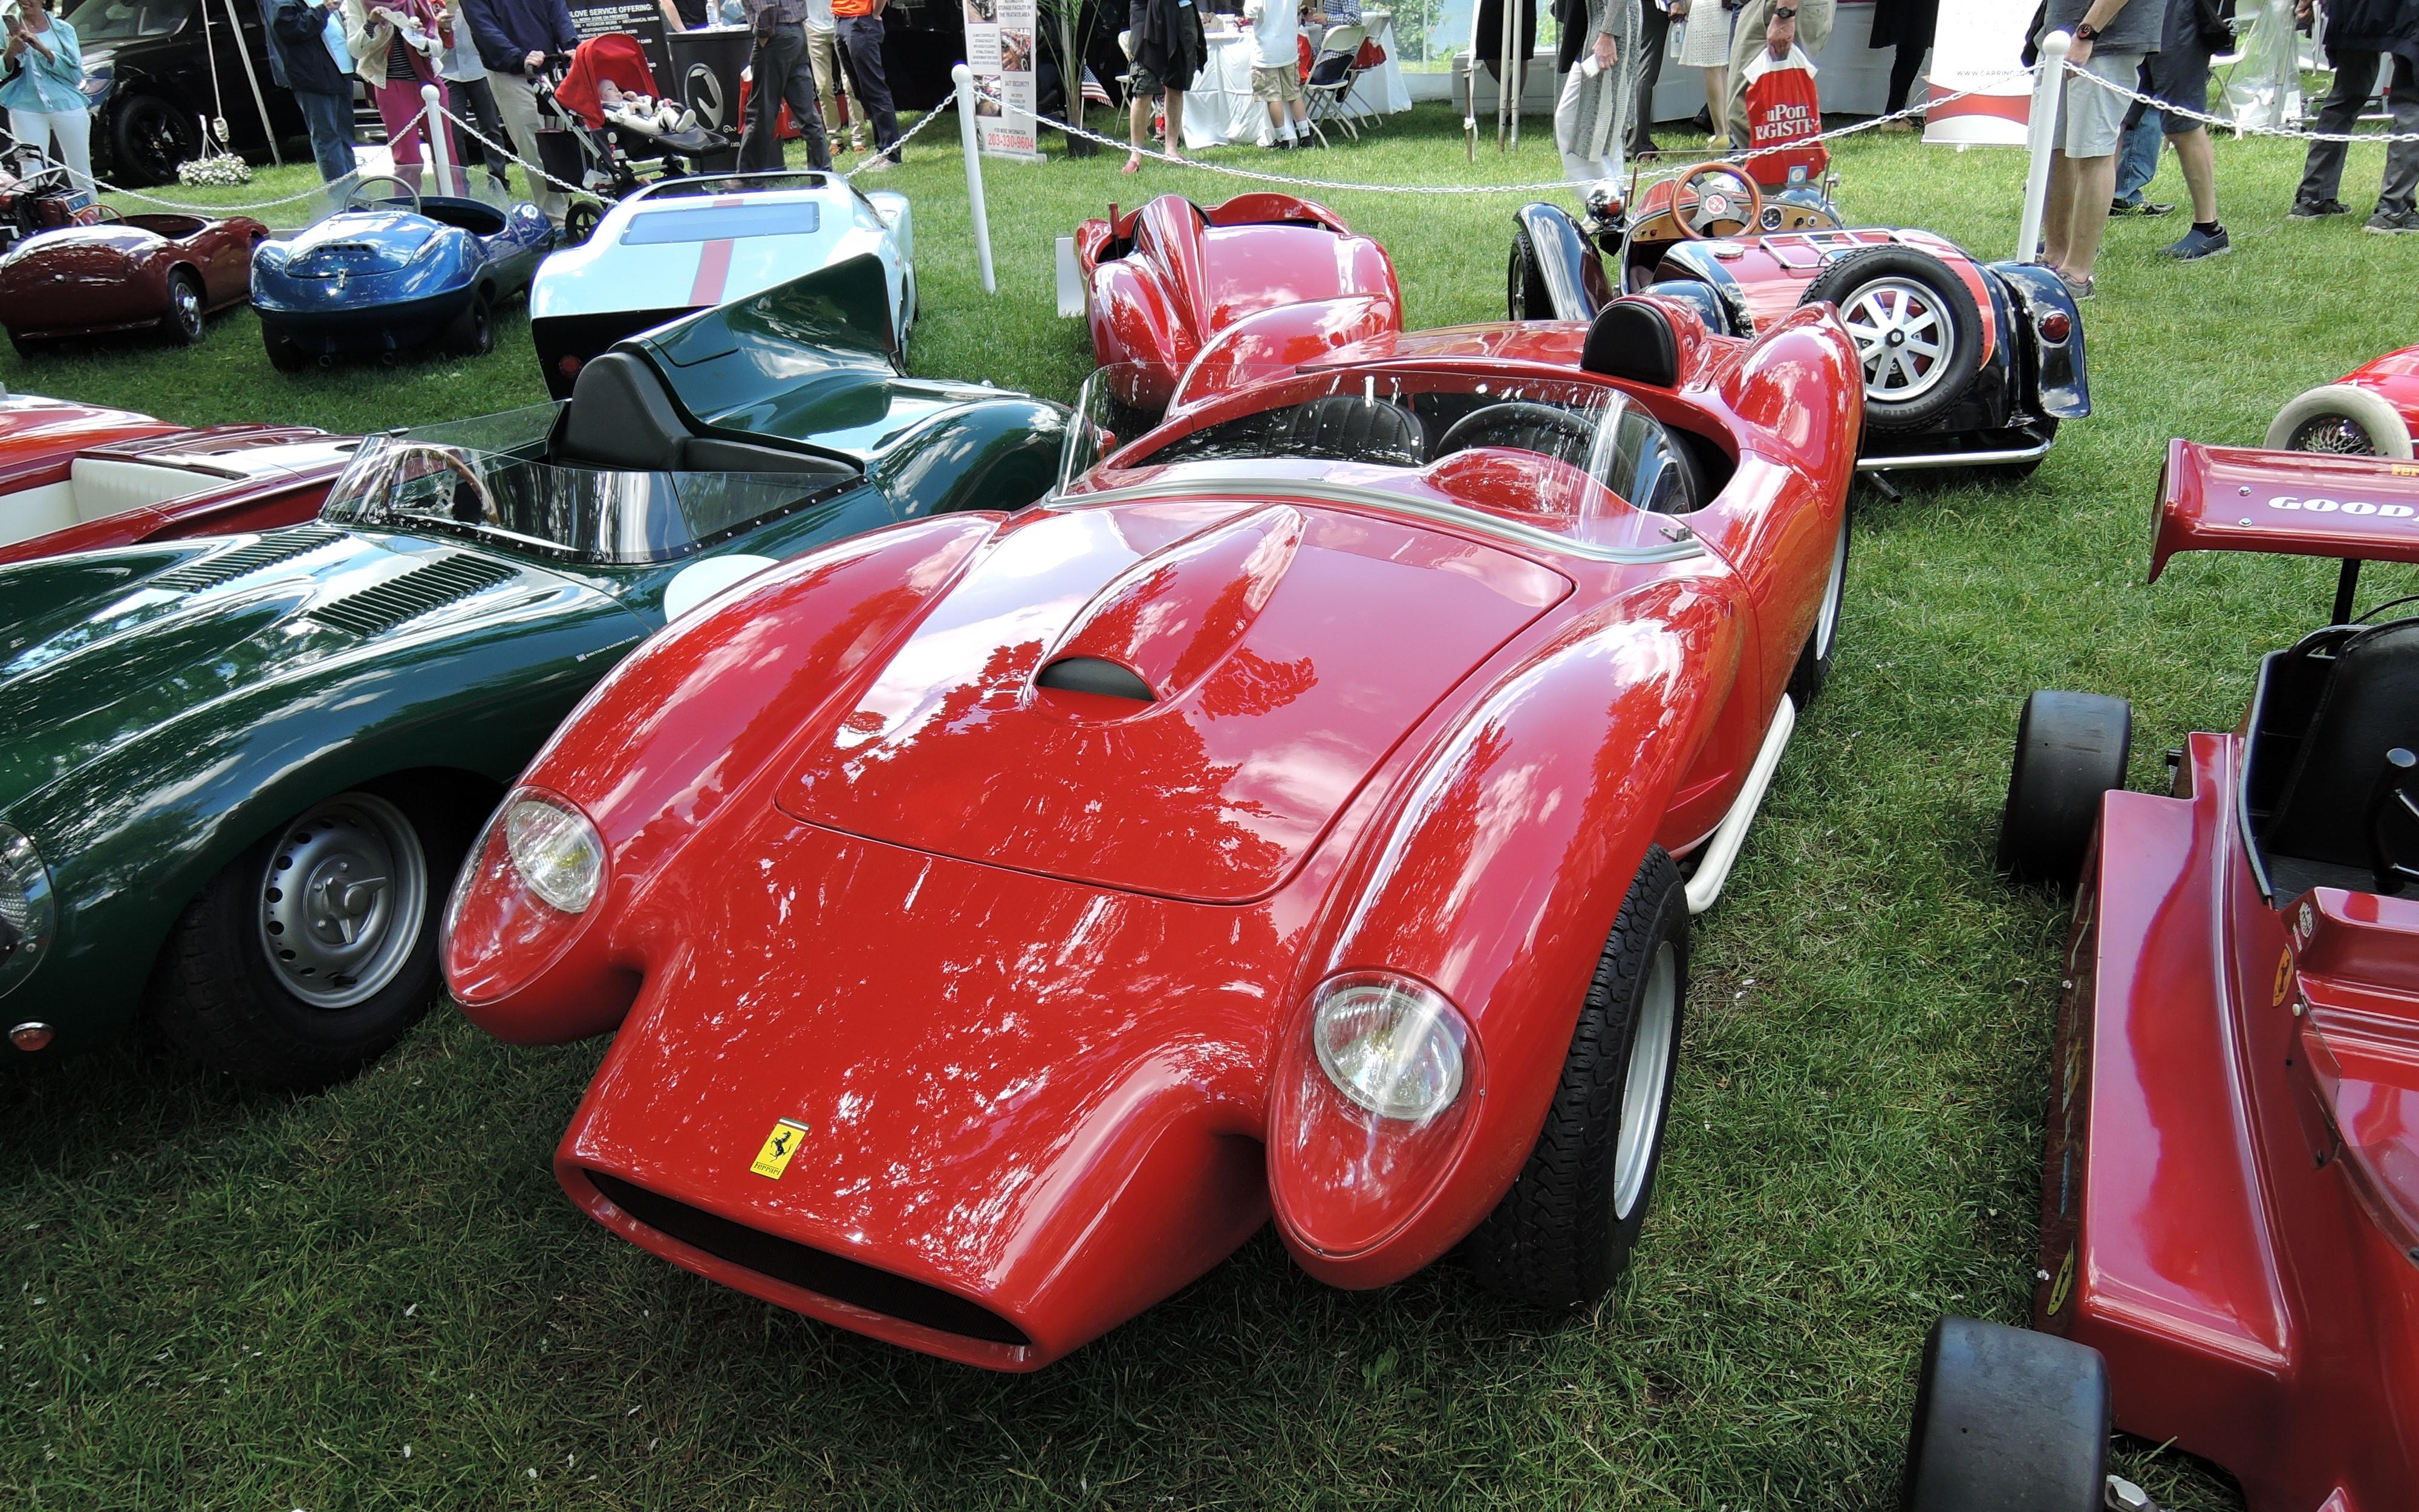 red Ferrari electric toy car - Greenwich Concours d'Elegance 2017